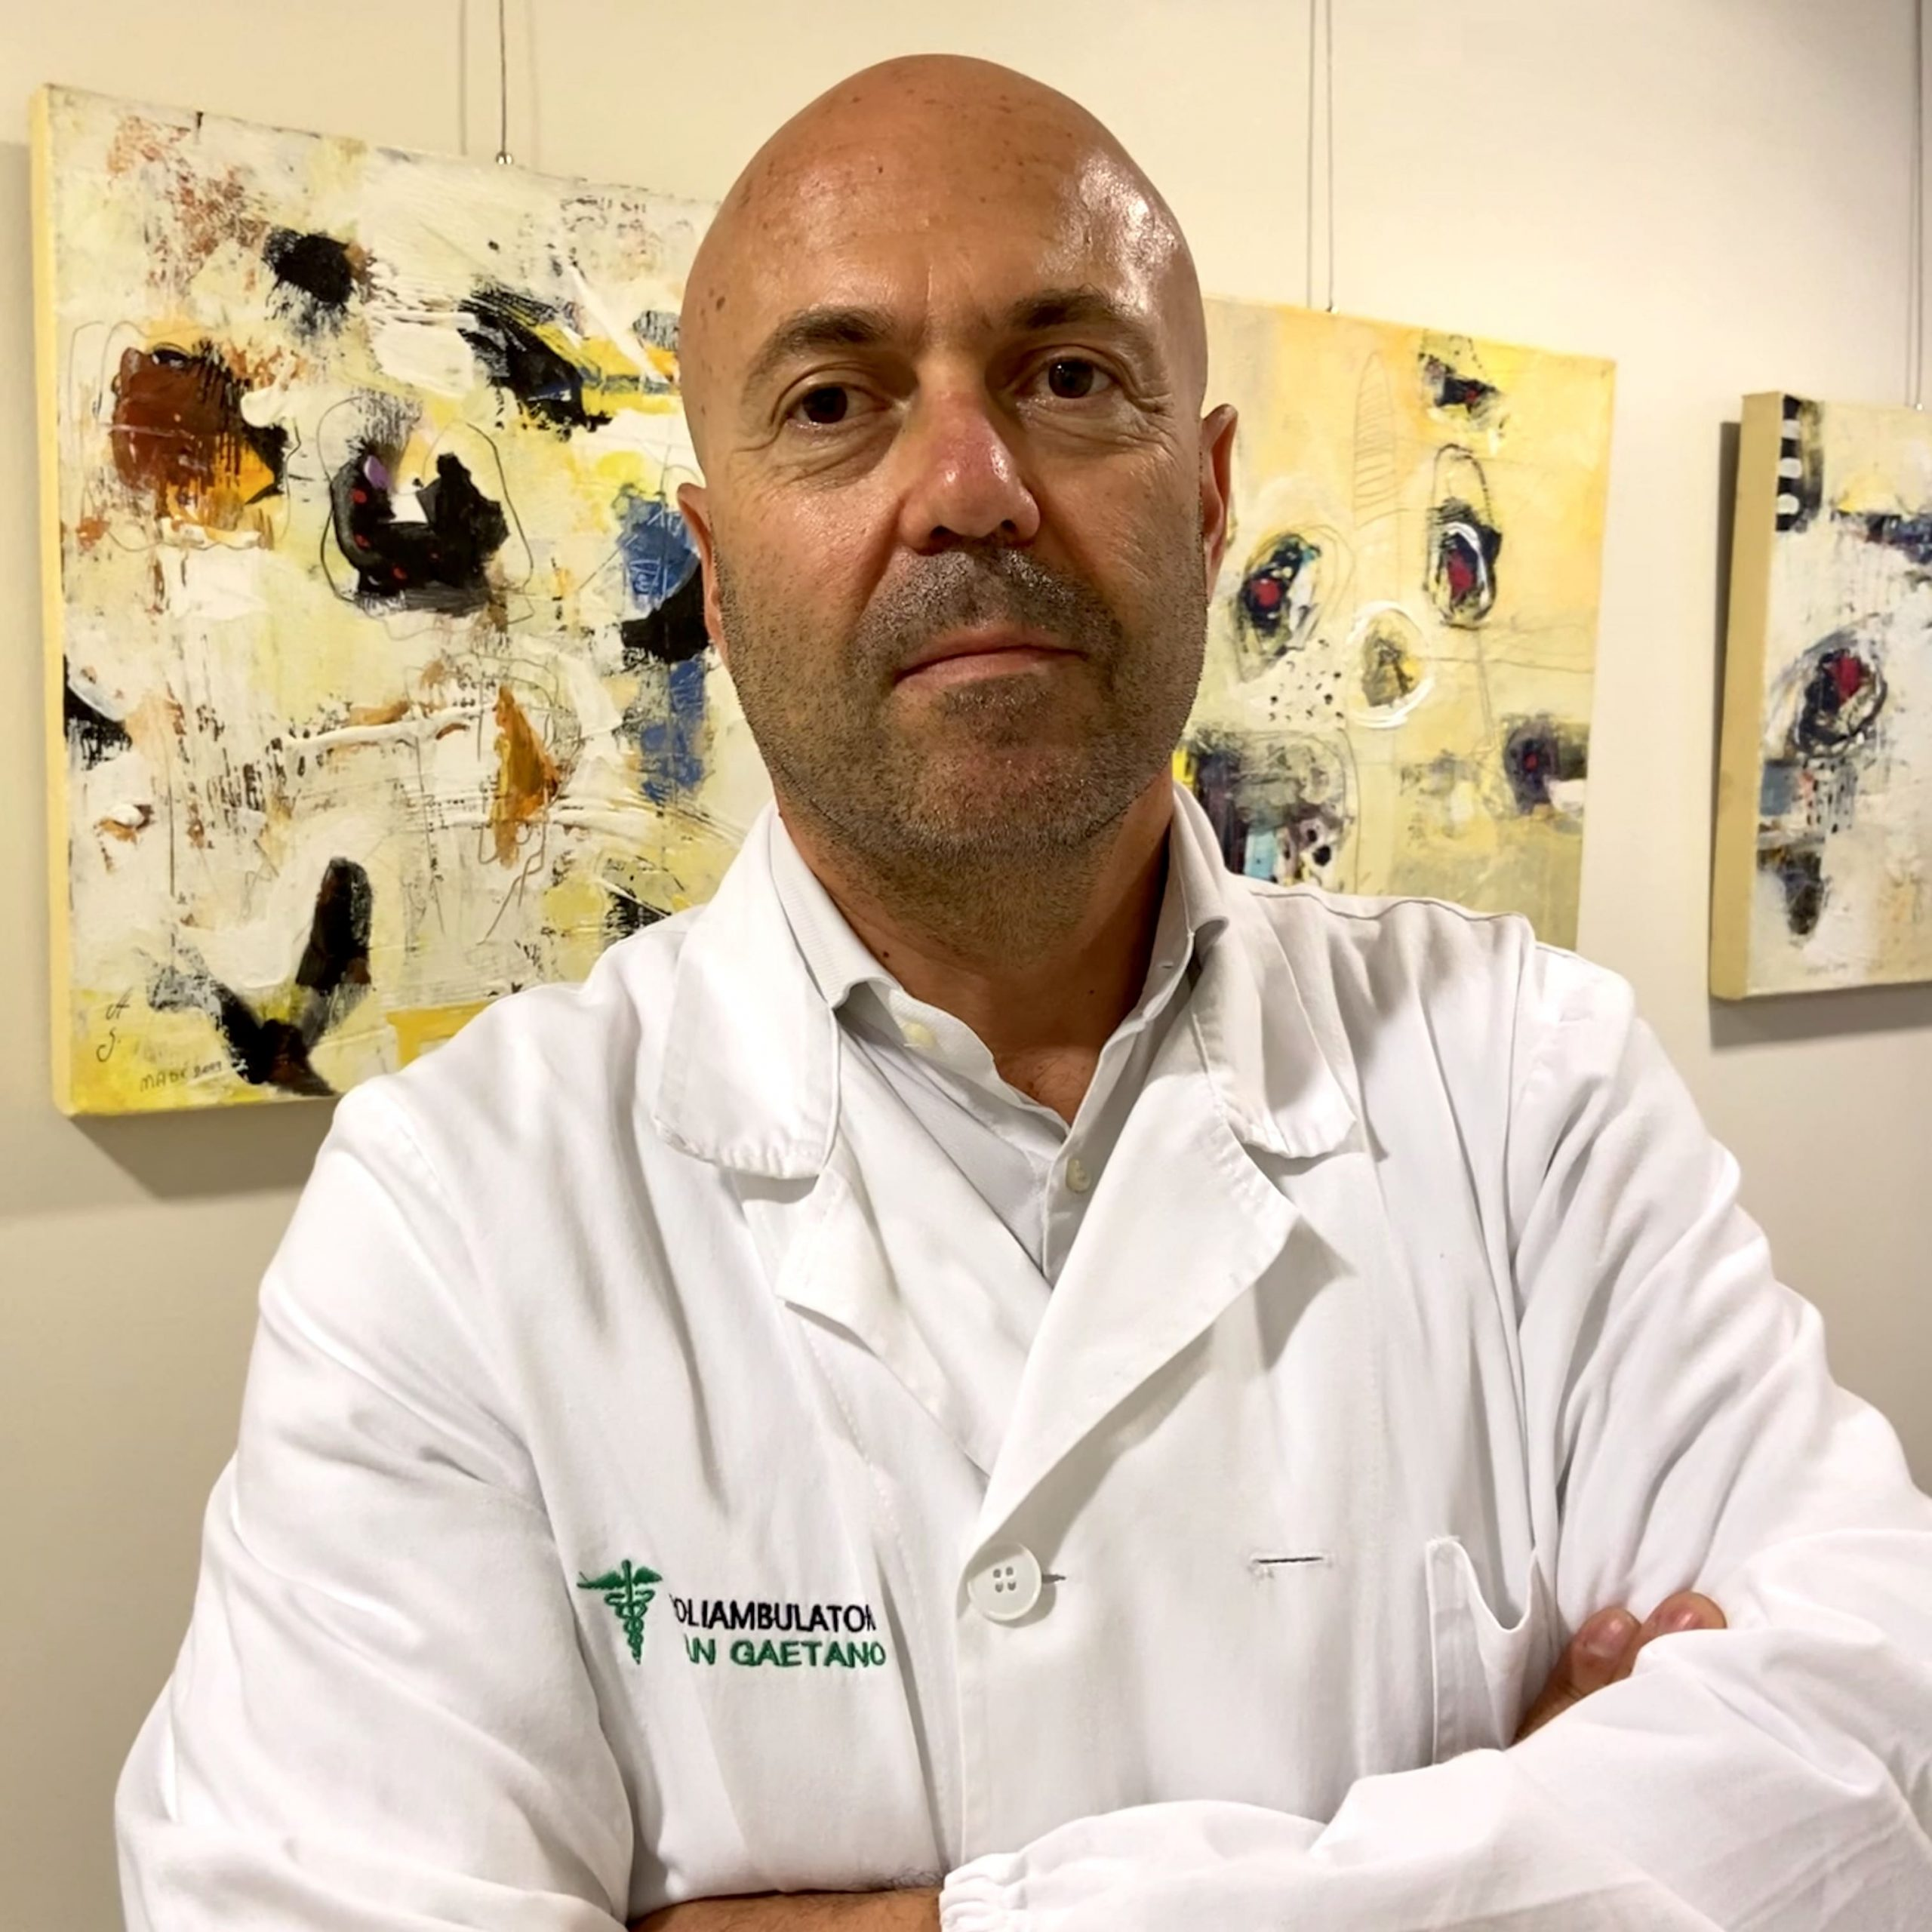 Dott. Ruffinella Davide